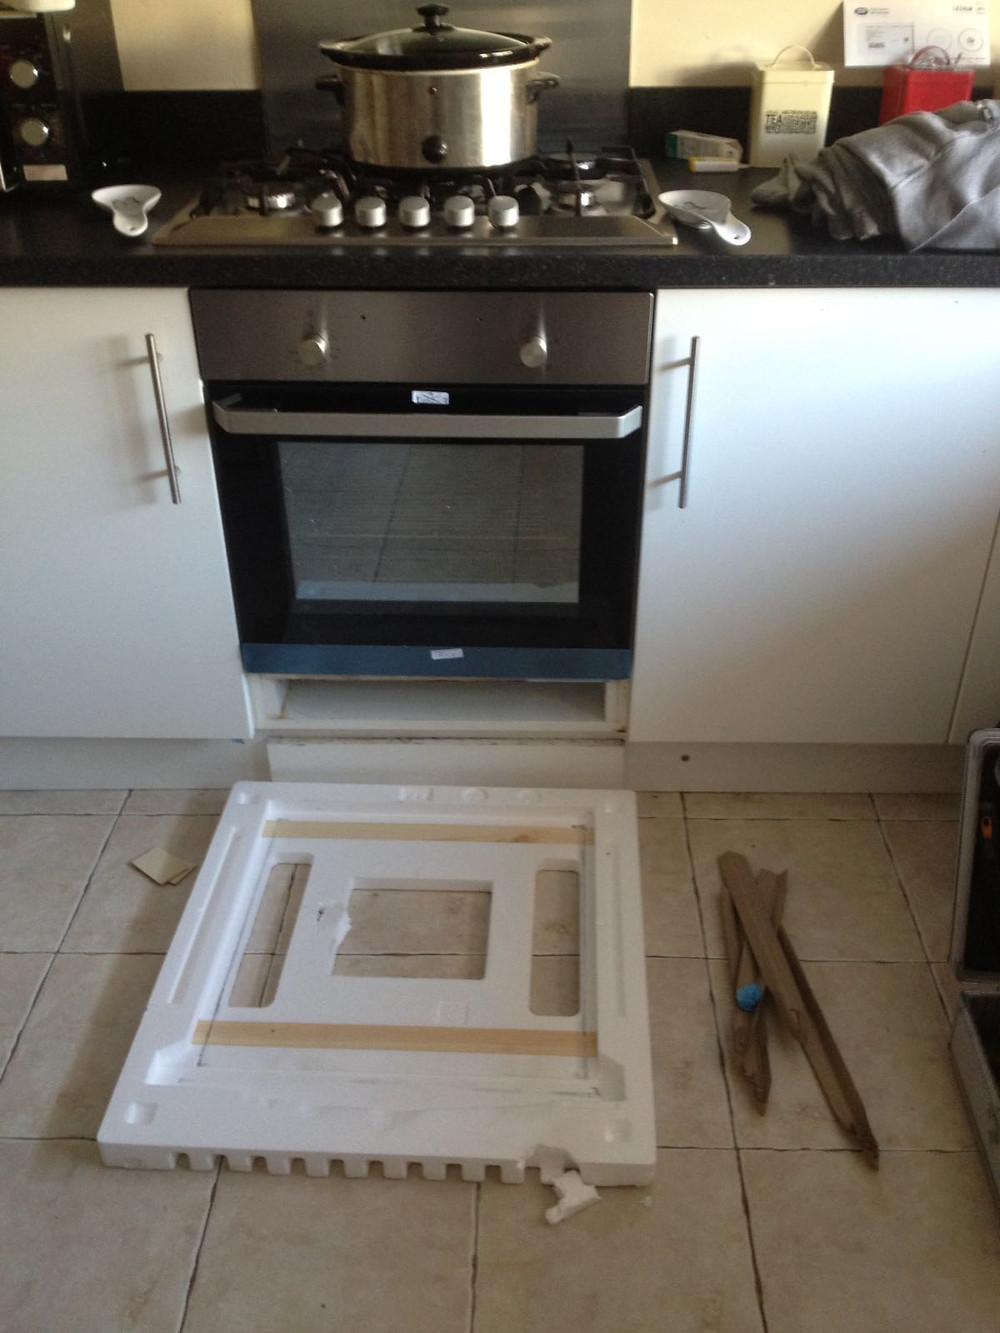 Built in oven installation